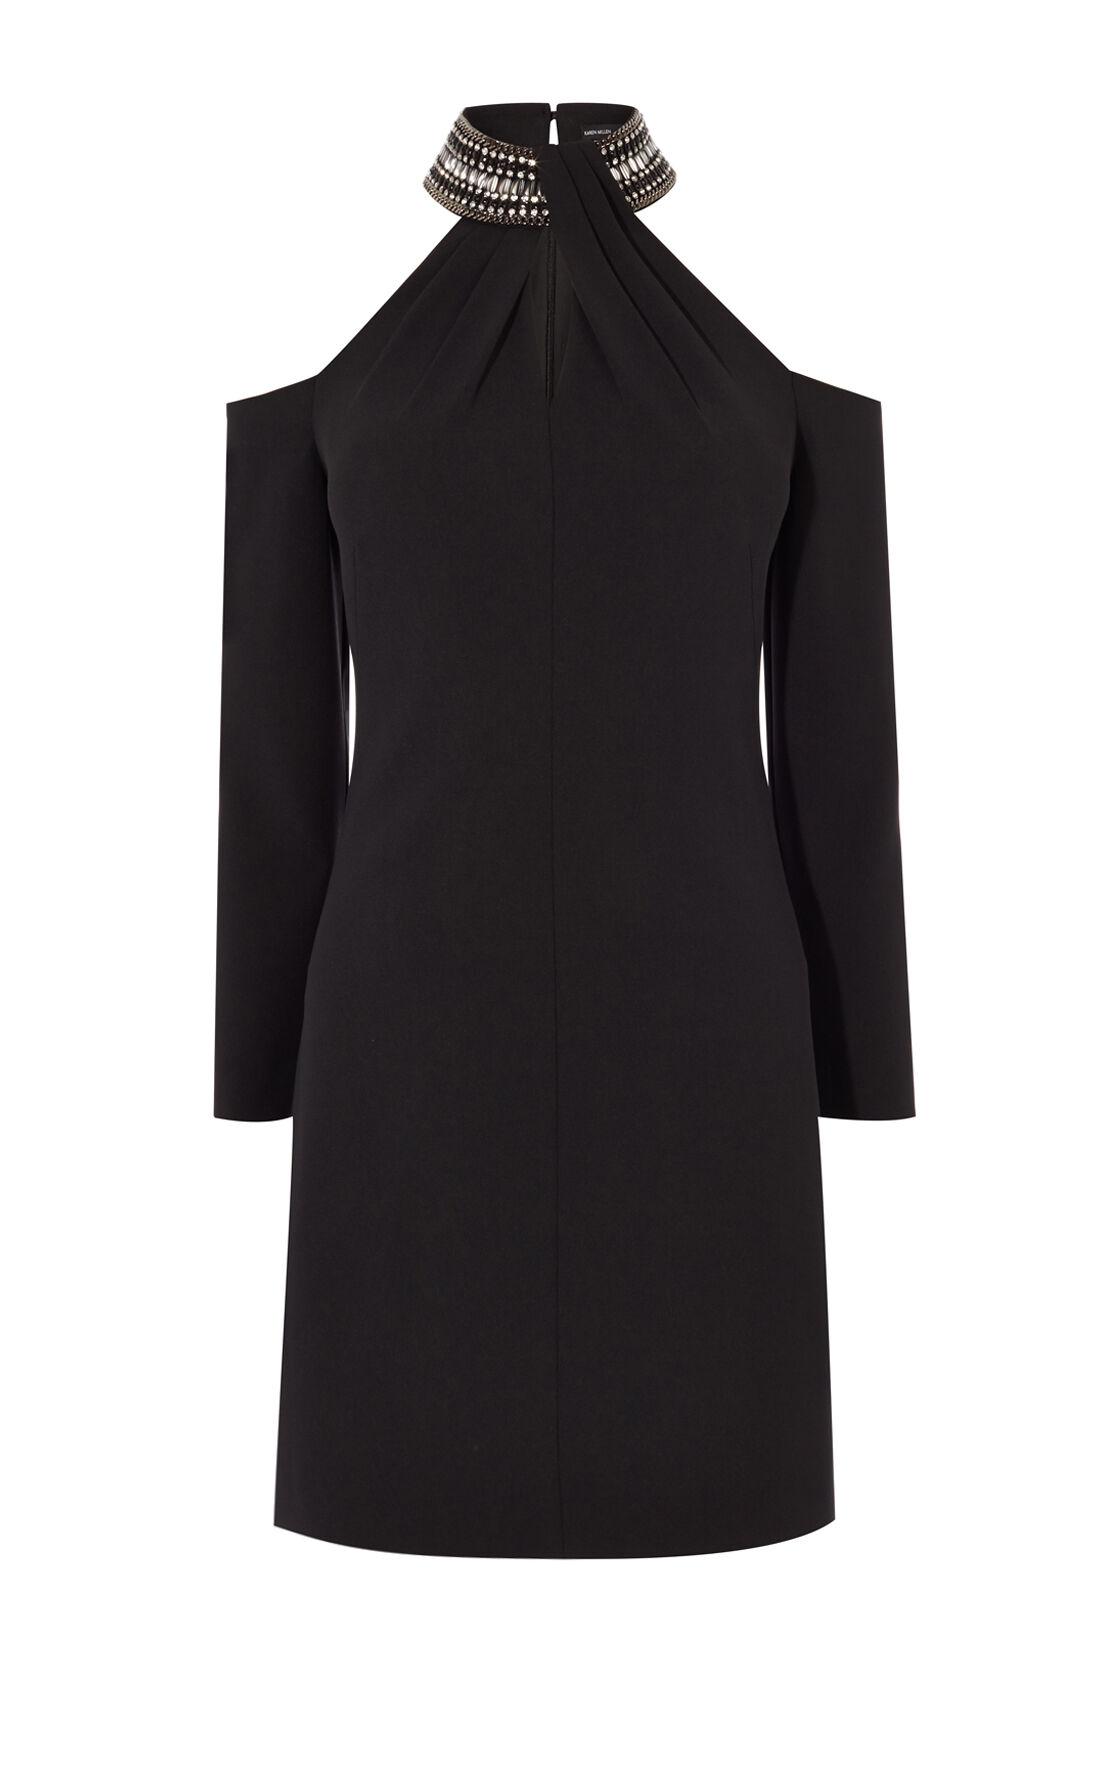 Karen Millen, JEWELLED NECKLINE DRESS Black 0